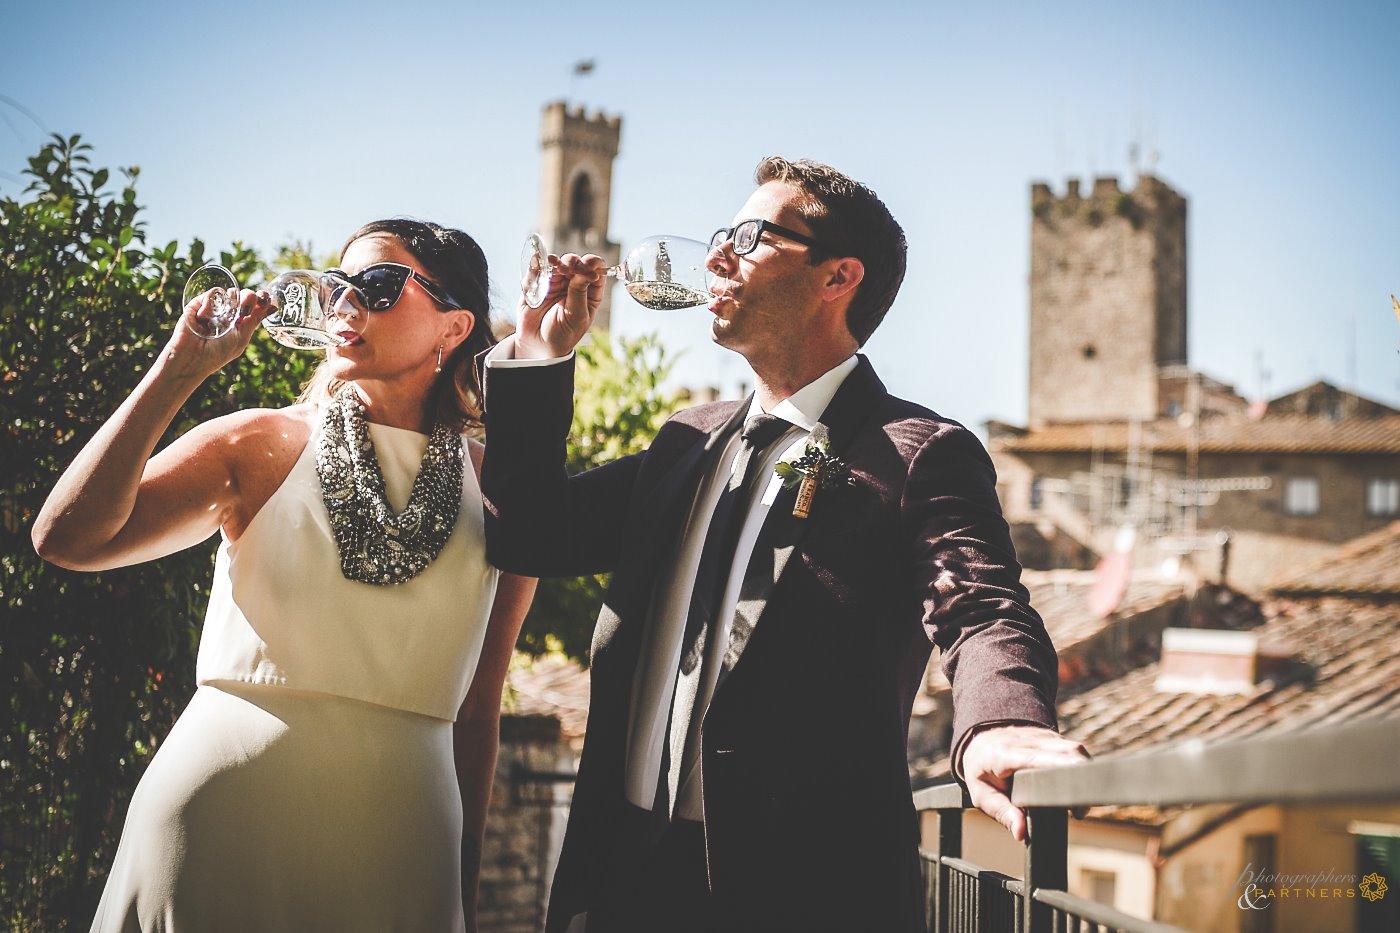 photography_marriage_volterra_03.jpg